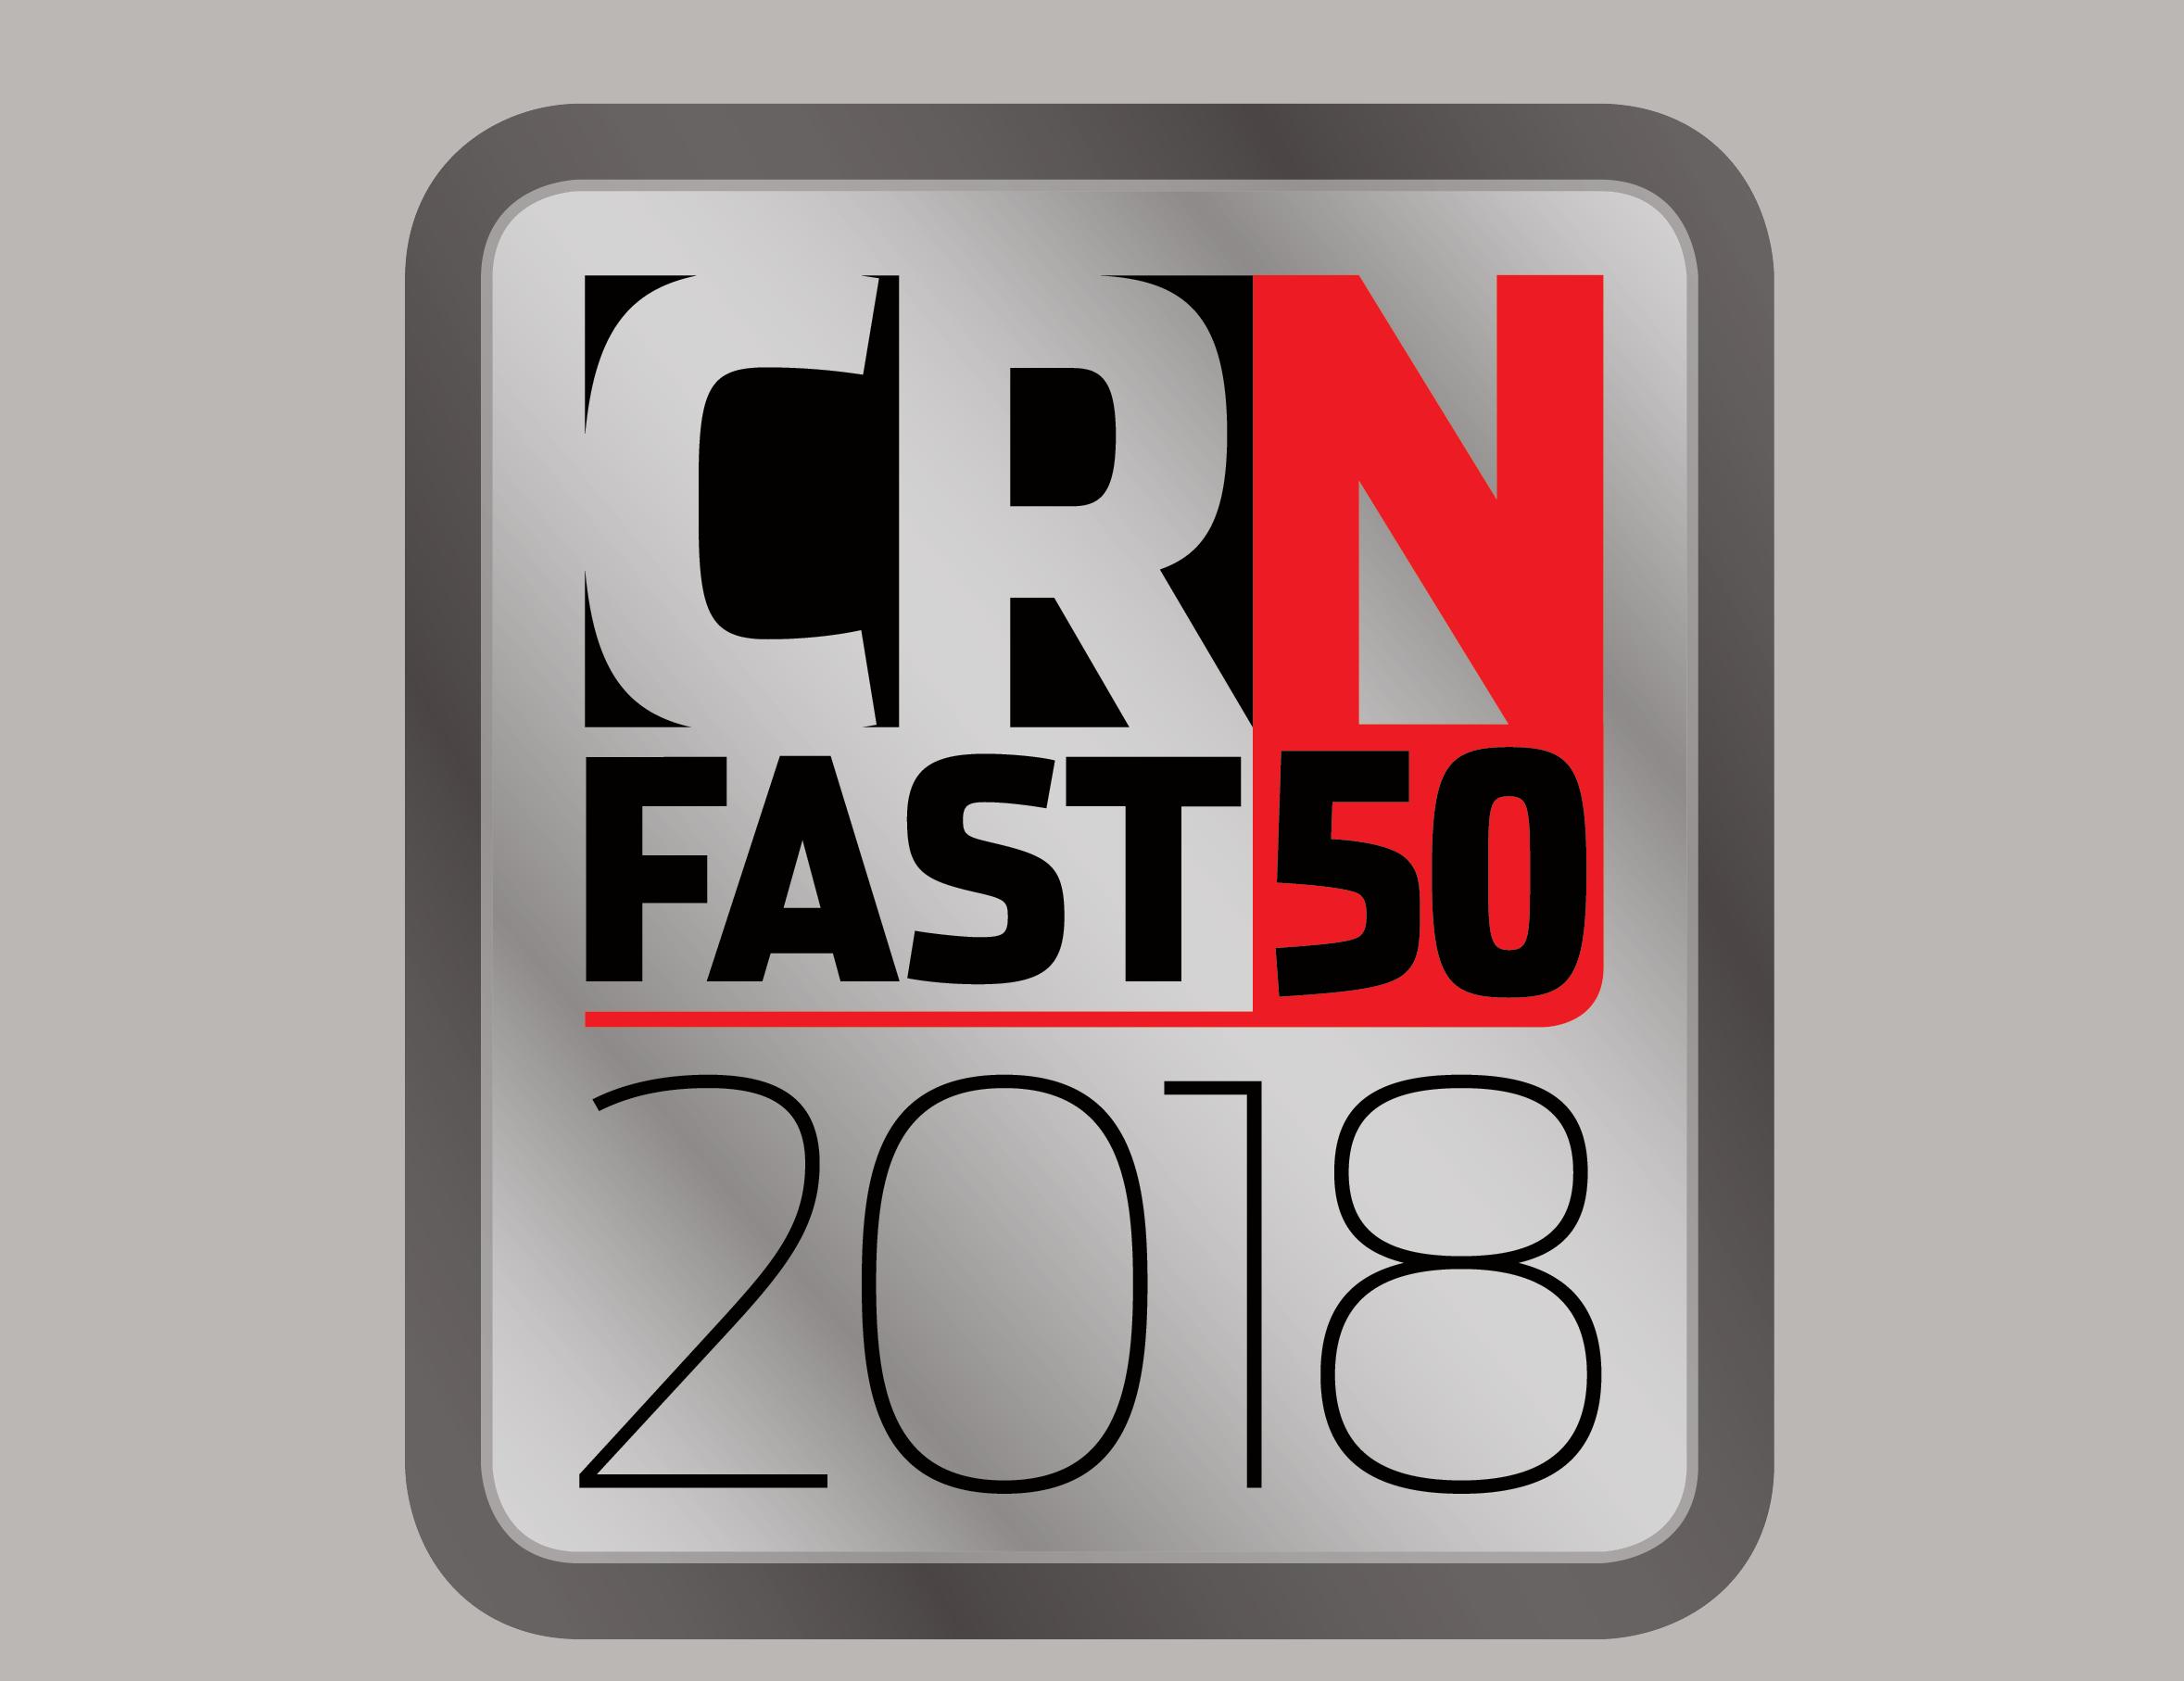 CRN FAST50_2018_AWARDBADGE_LRG